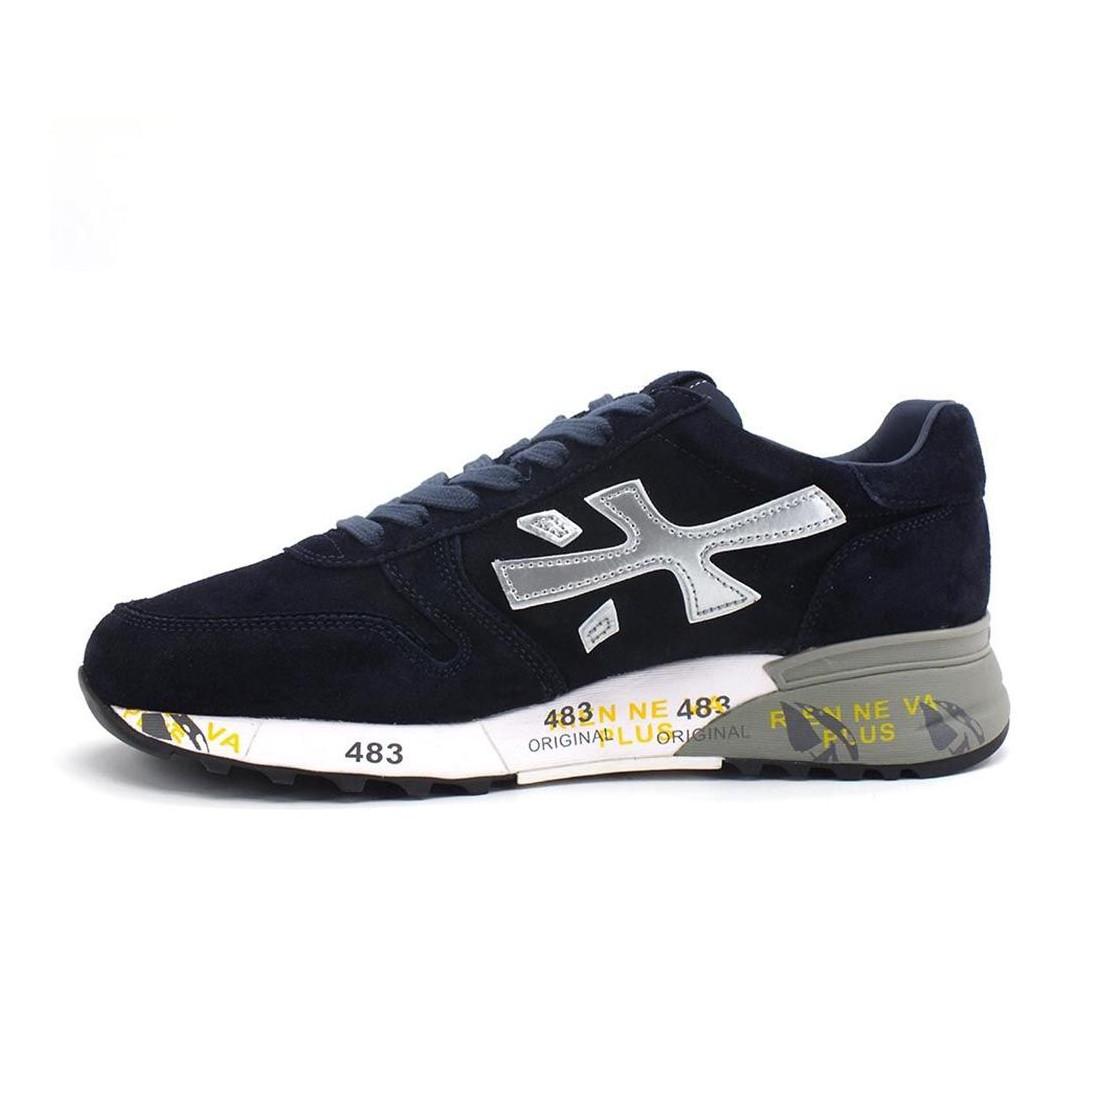 sneakers man premiata mick4016 9037